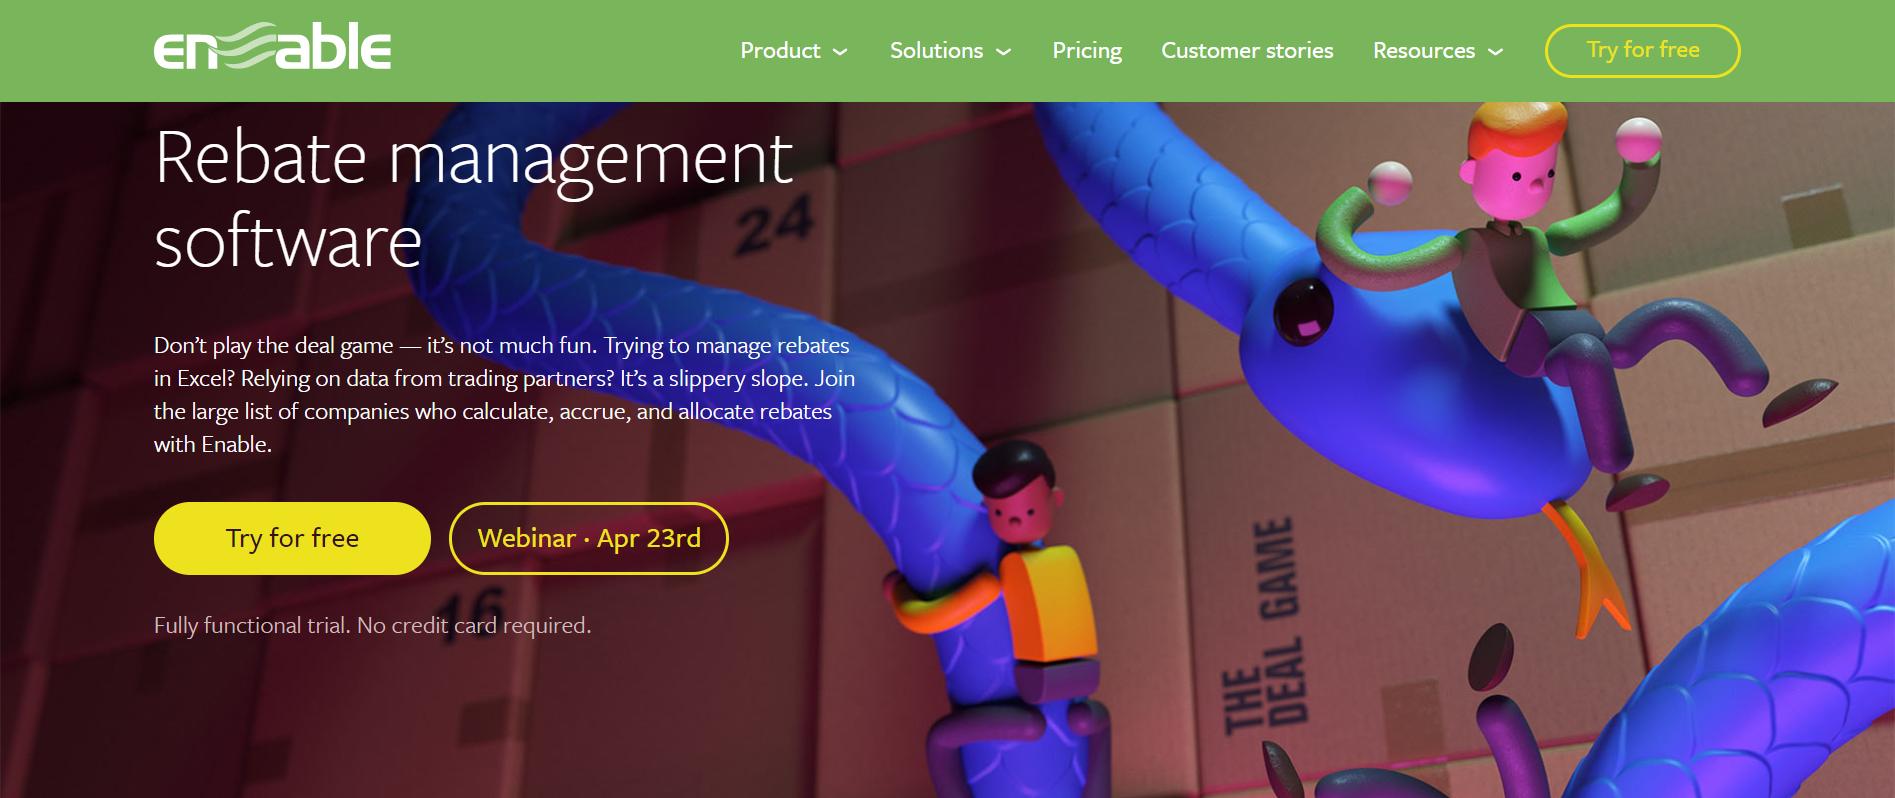 Shopify推出可视化3D模型和视频功能,帮助电商卖家提高转化率